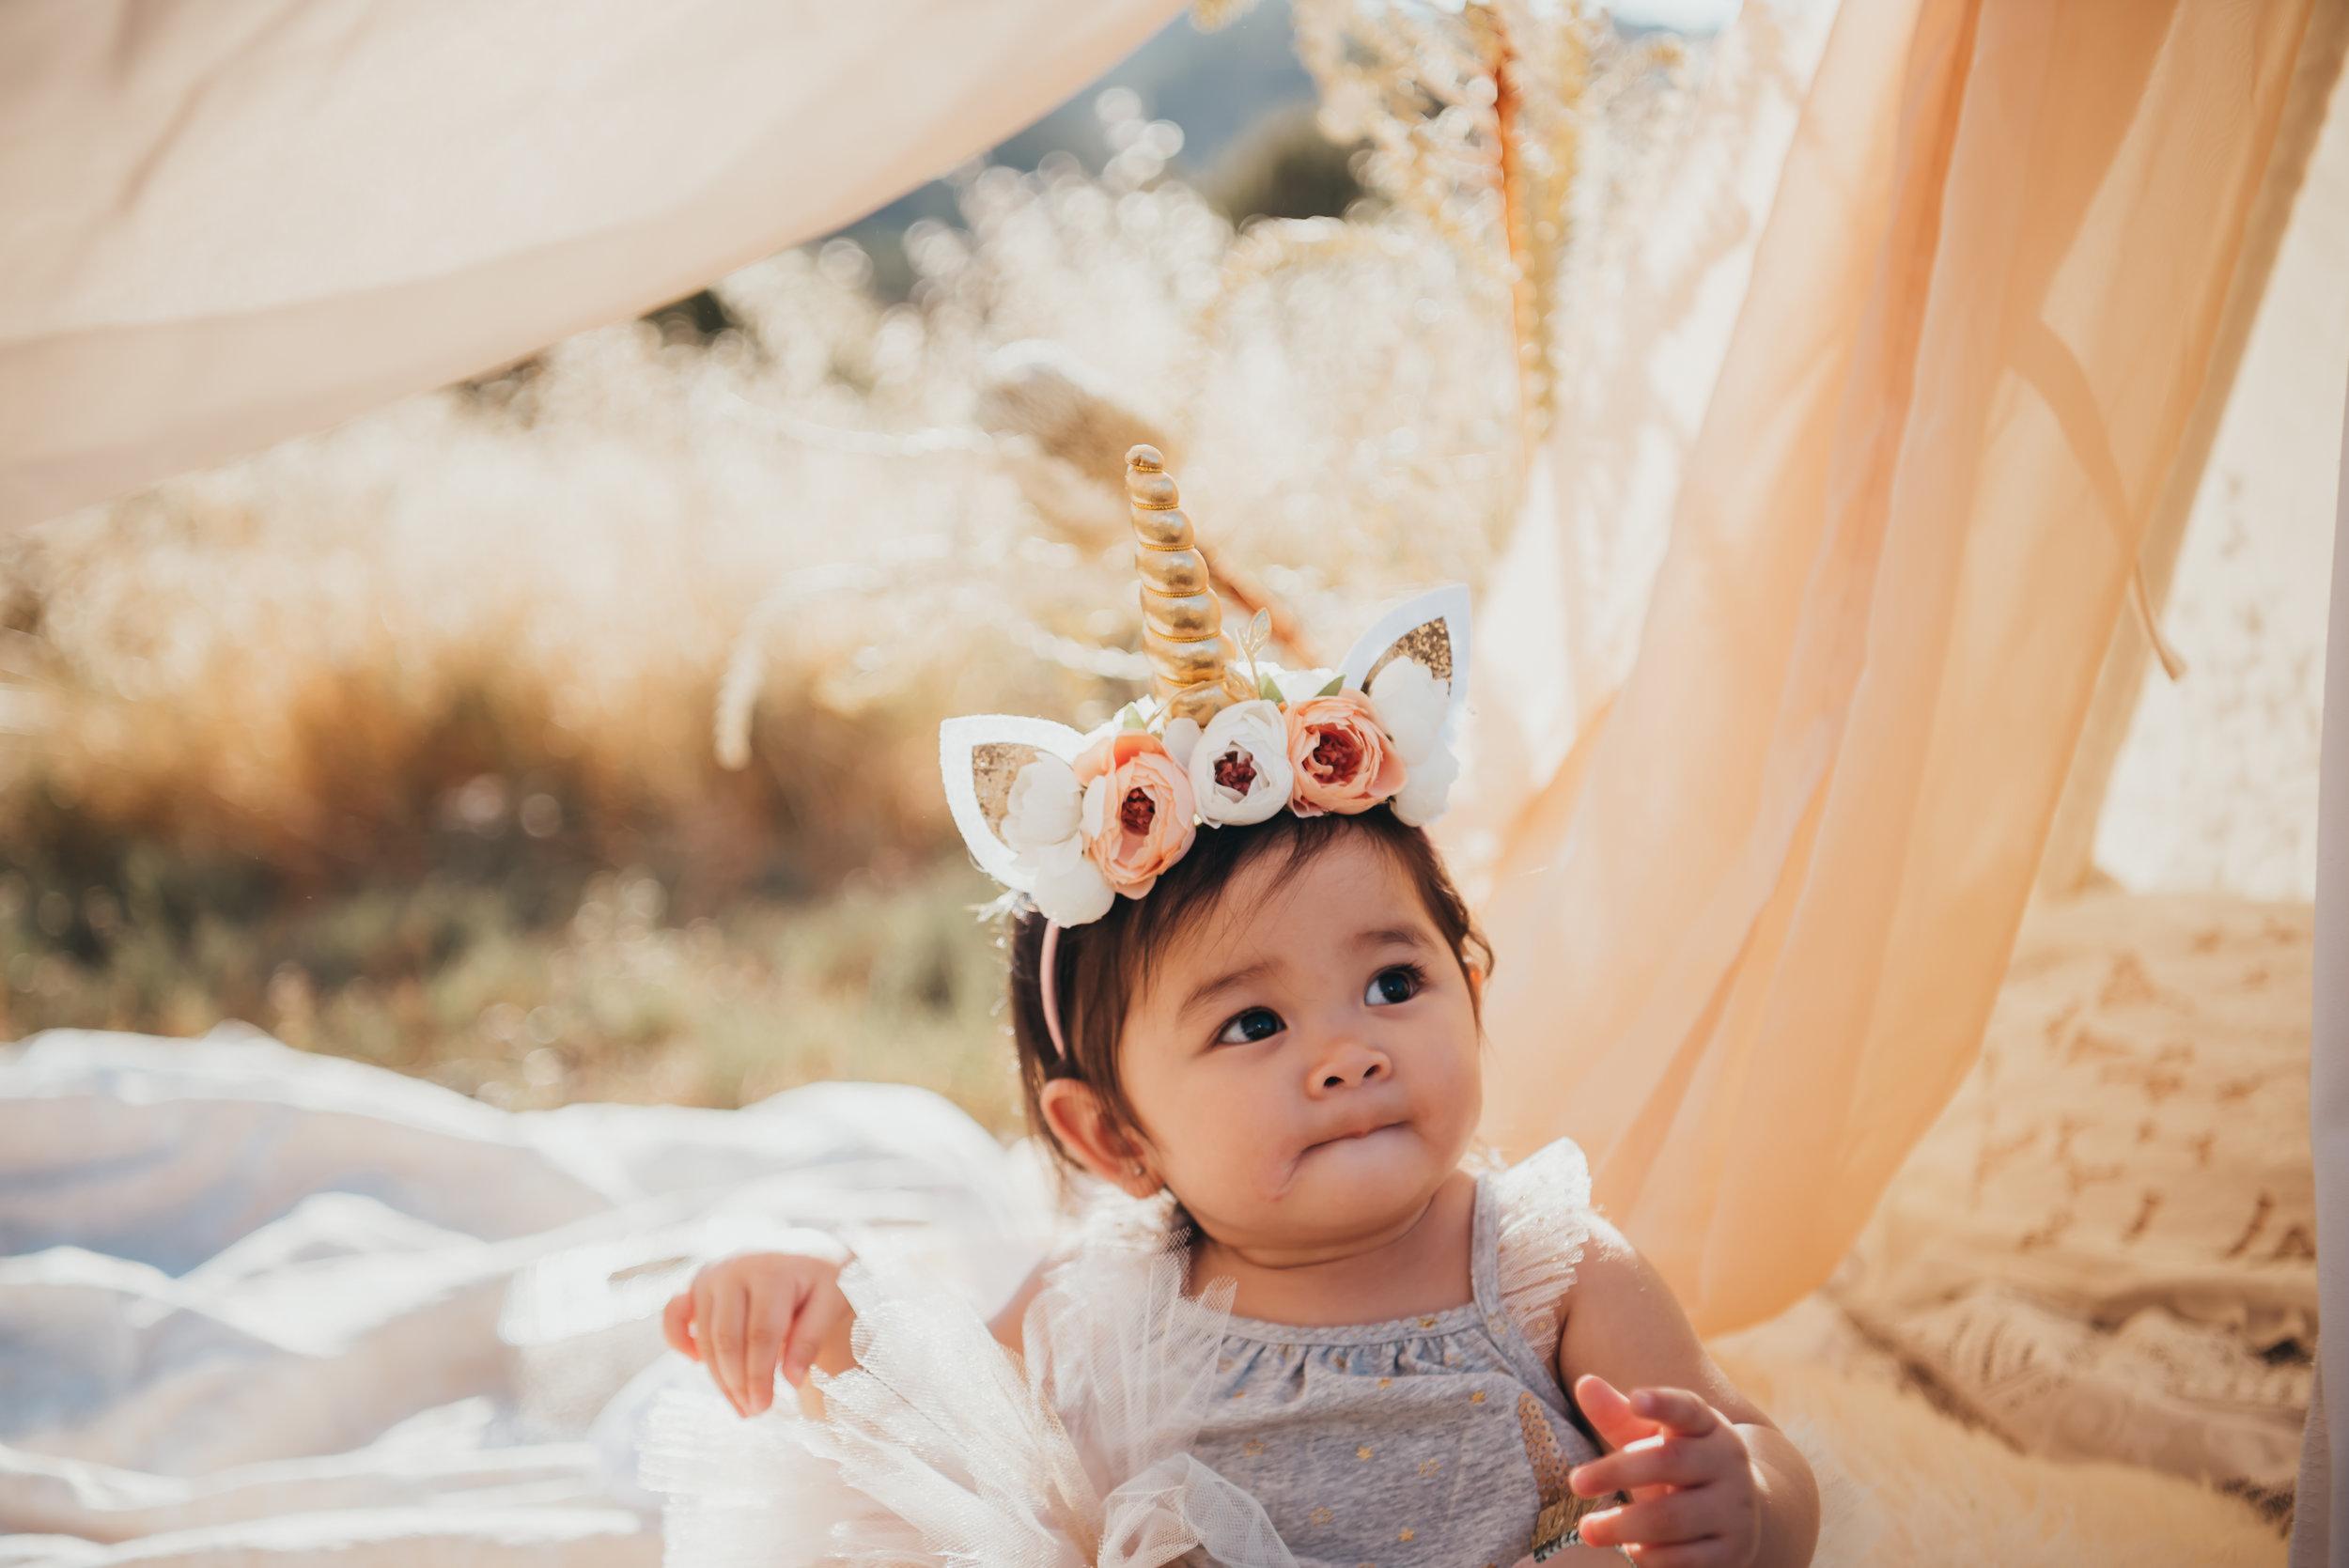 FINAL_Lets_Spread_Beauty_Photography_Landon_Newborn20180903_0020.jpg